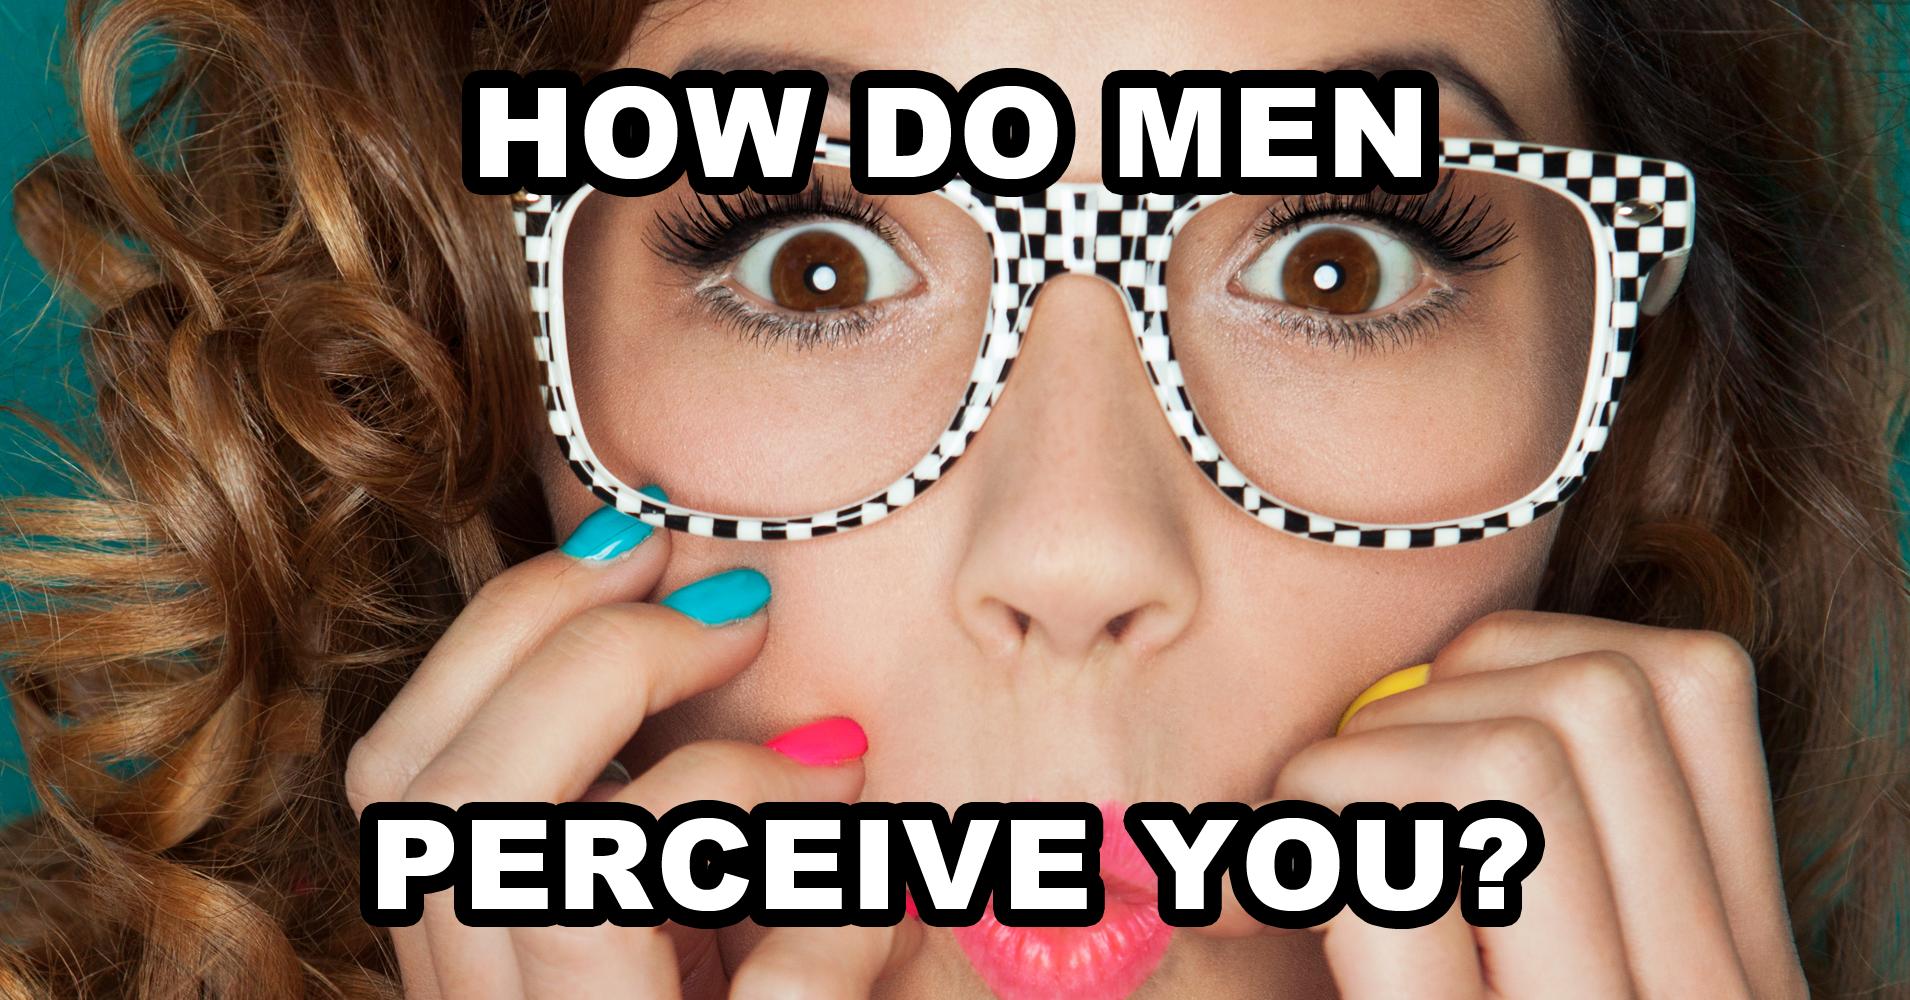 How Do Men Perceive You? - Quiz Result